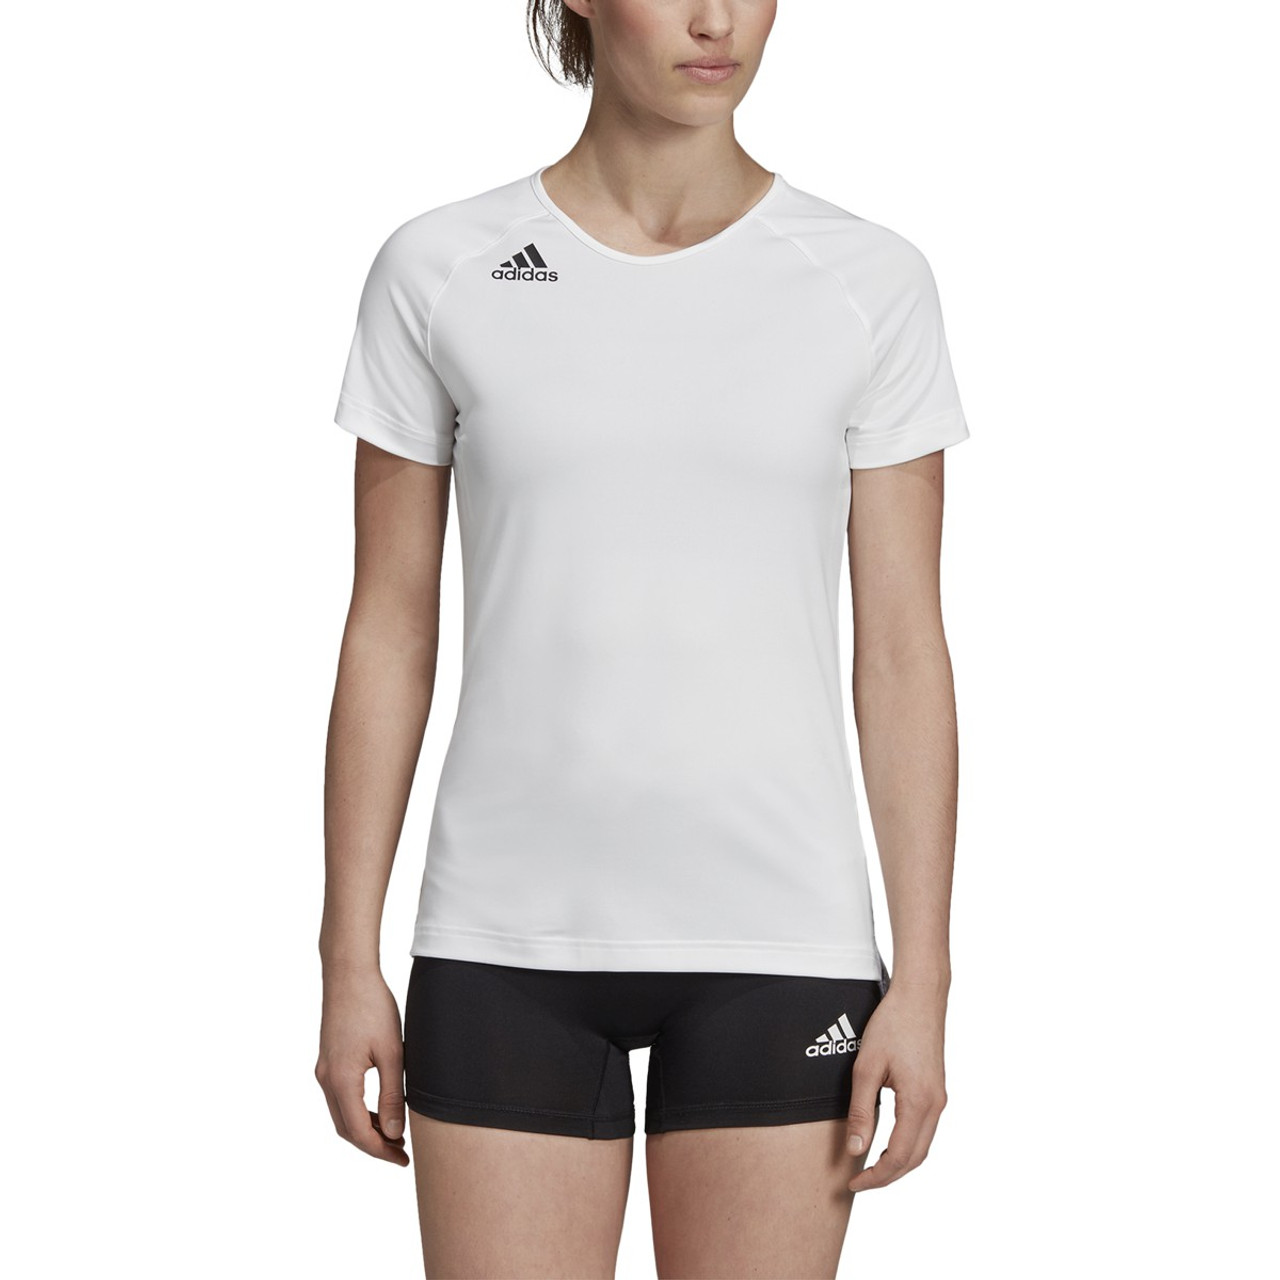 Adidas HILO Women's Short Sleeve Volleyball Shirt DP4343 - White, Black